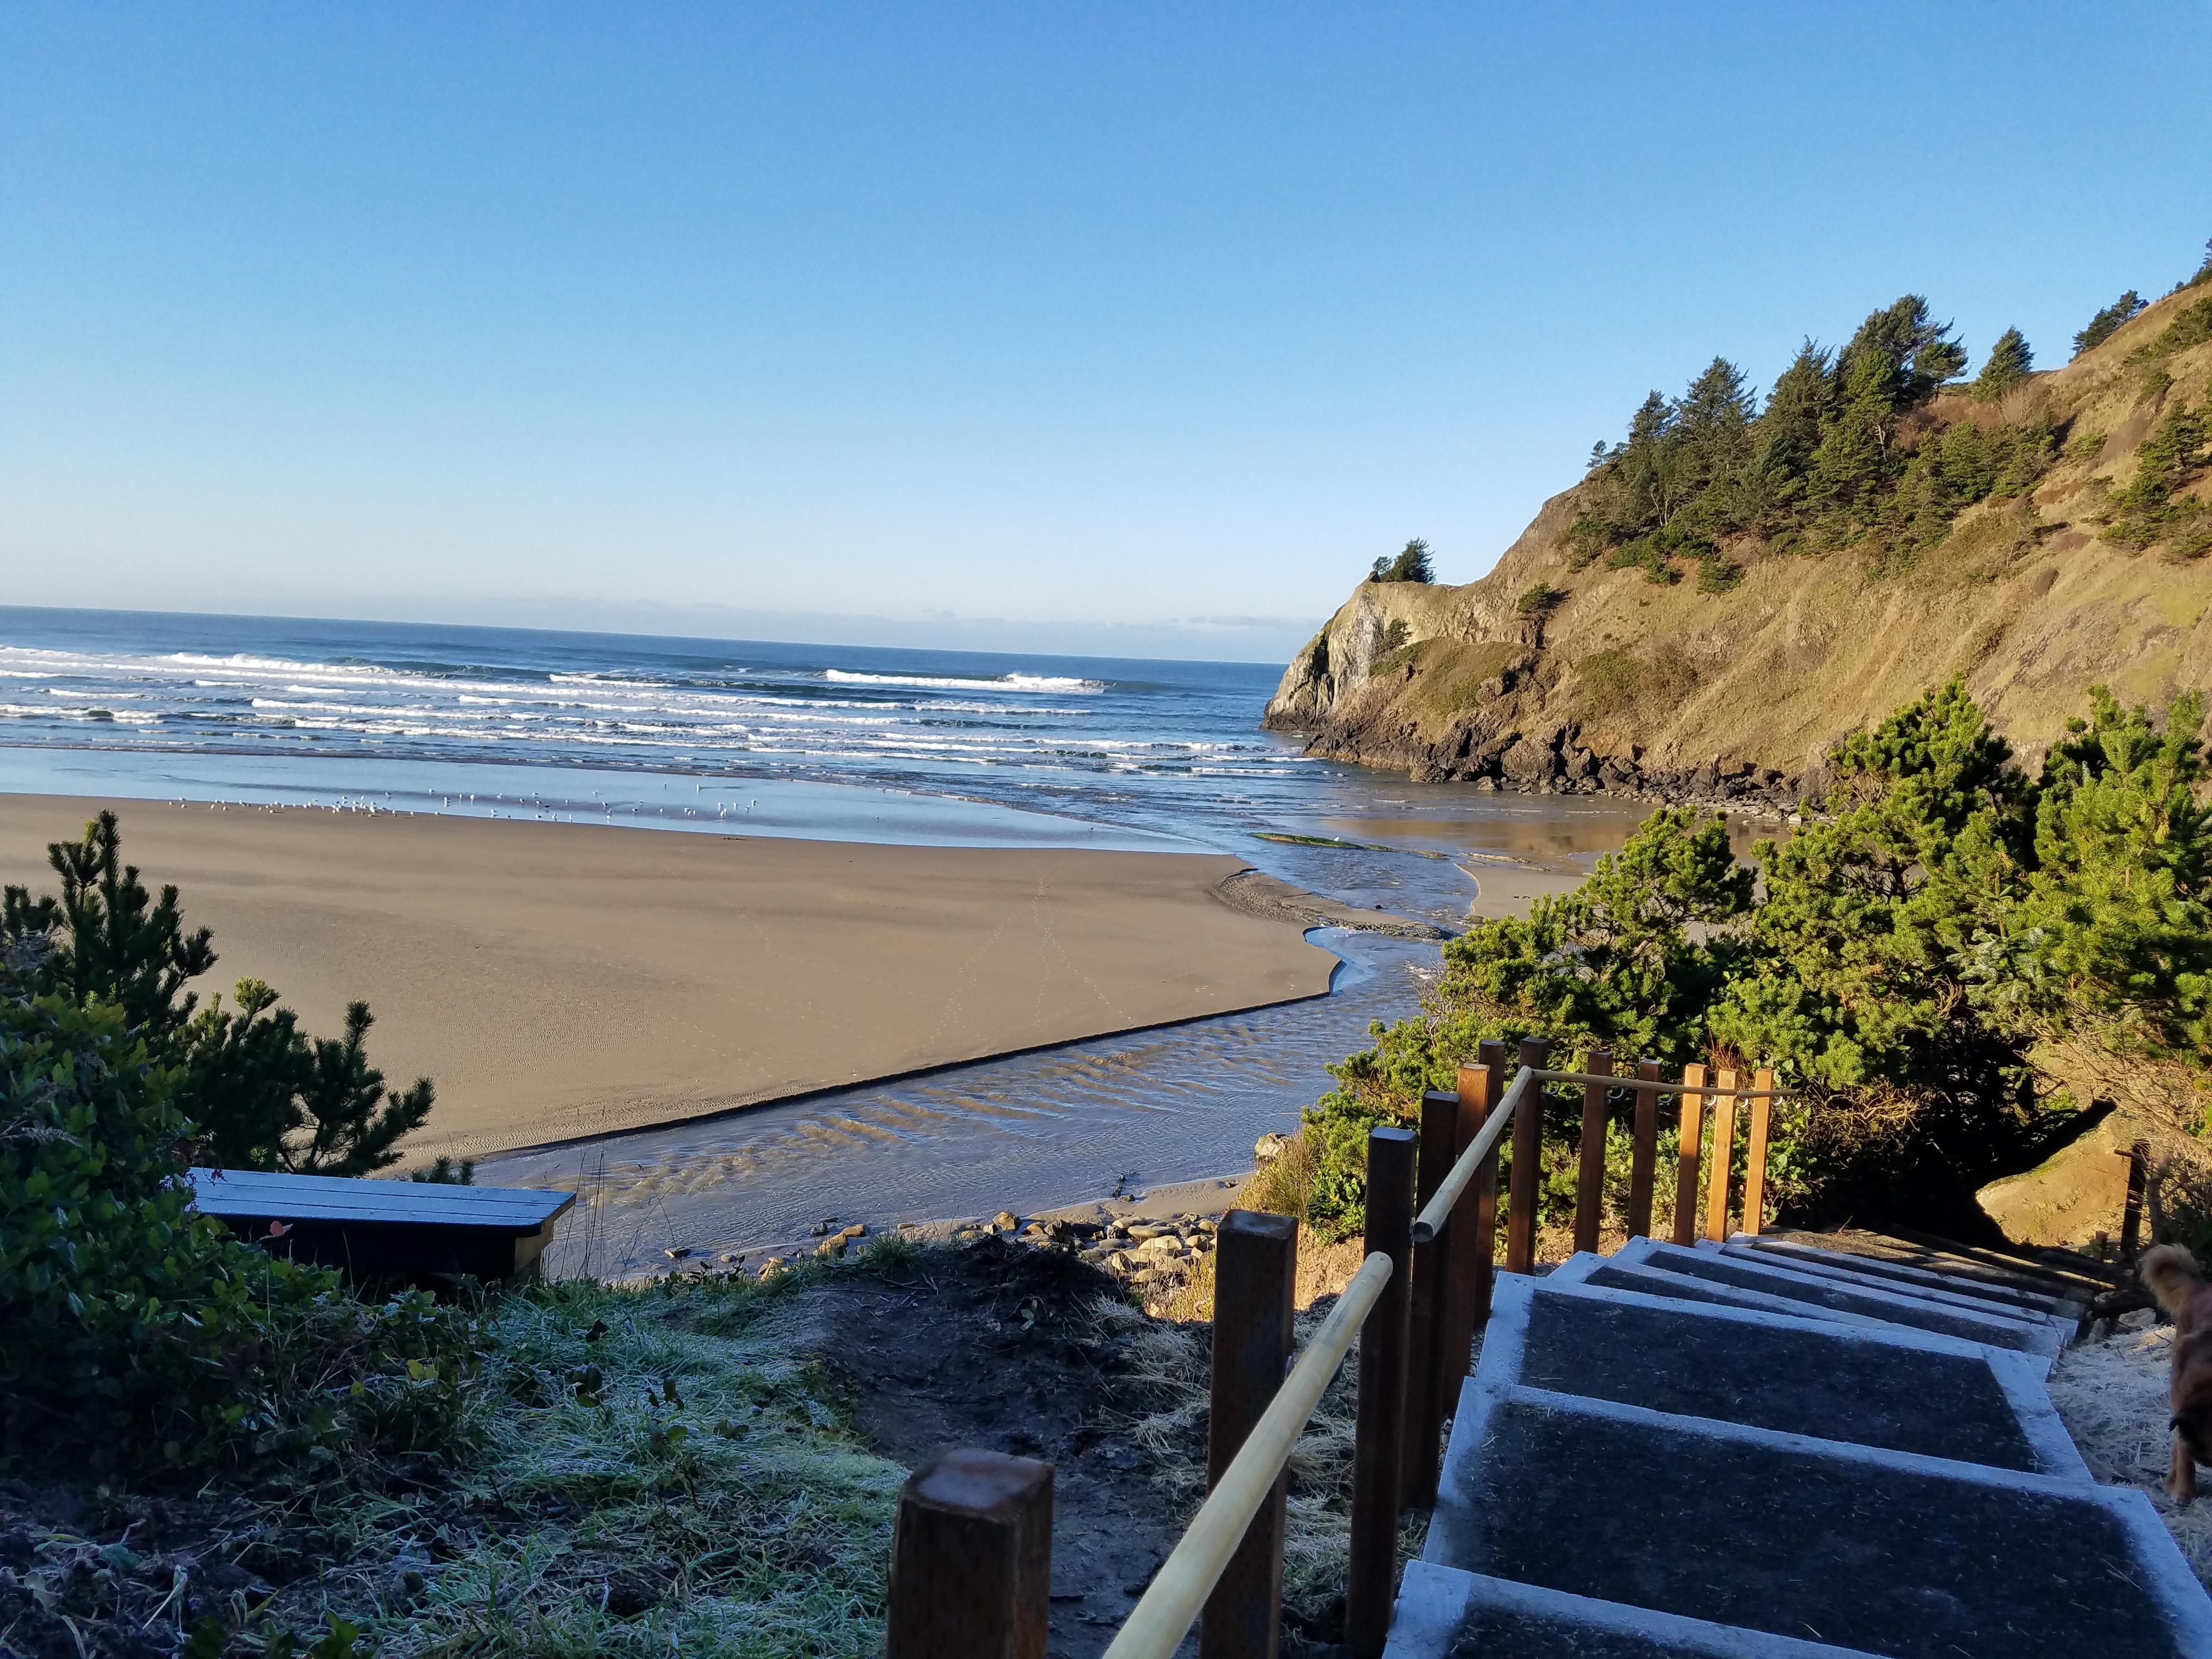 Vacation Rentals Agate Beach Oregon